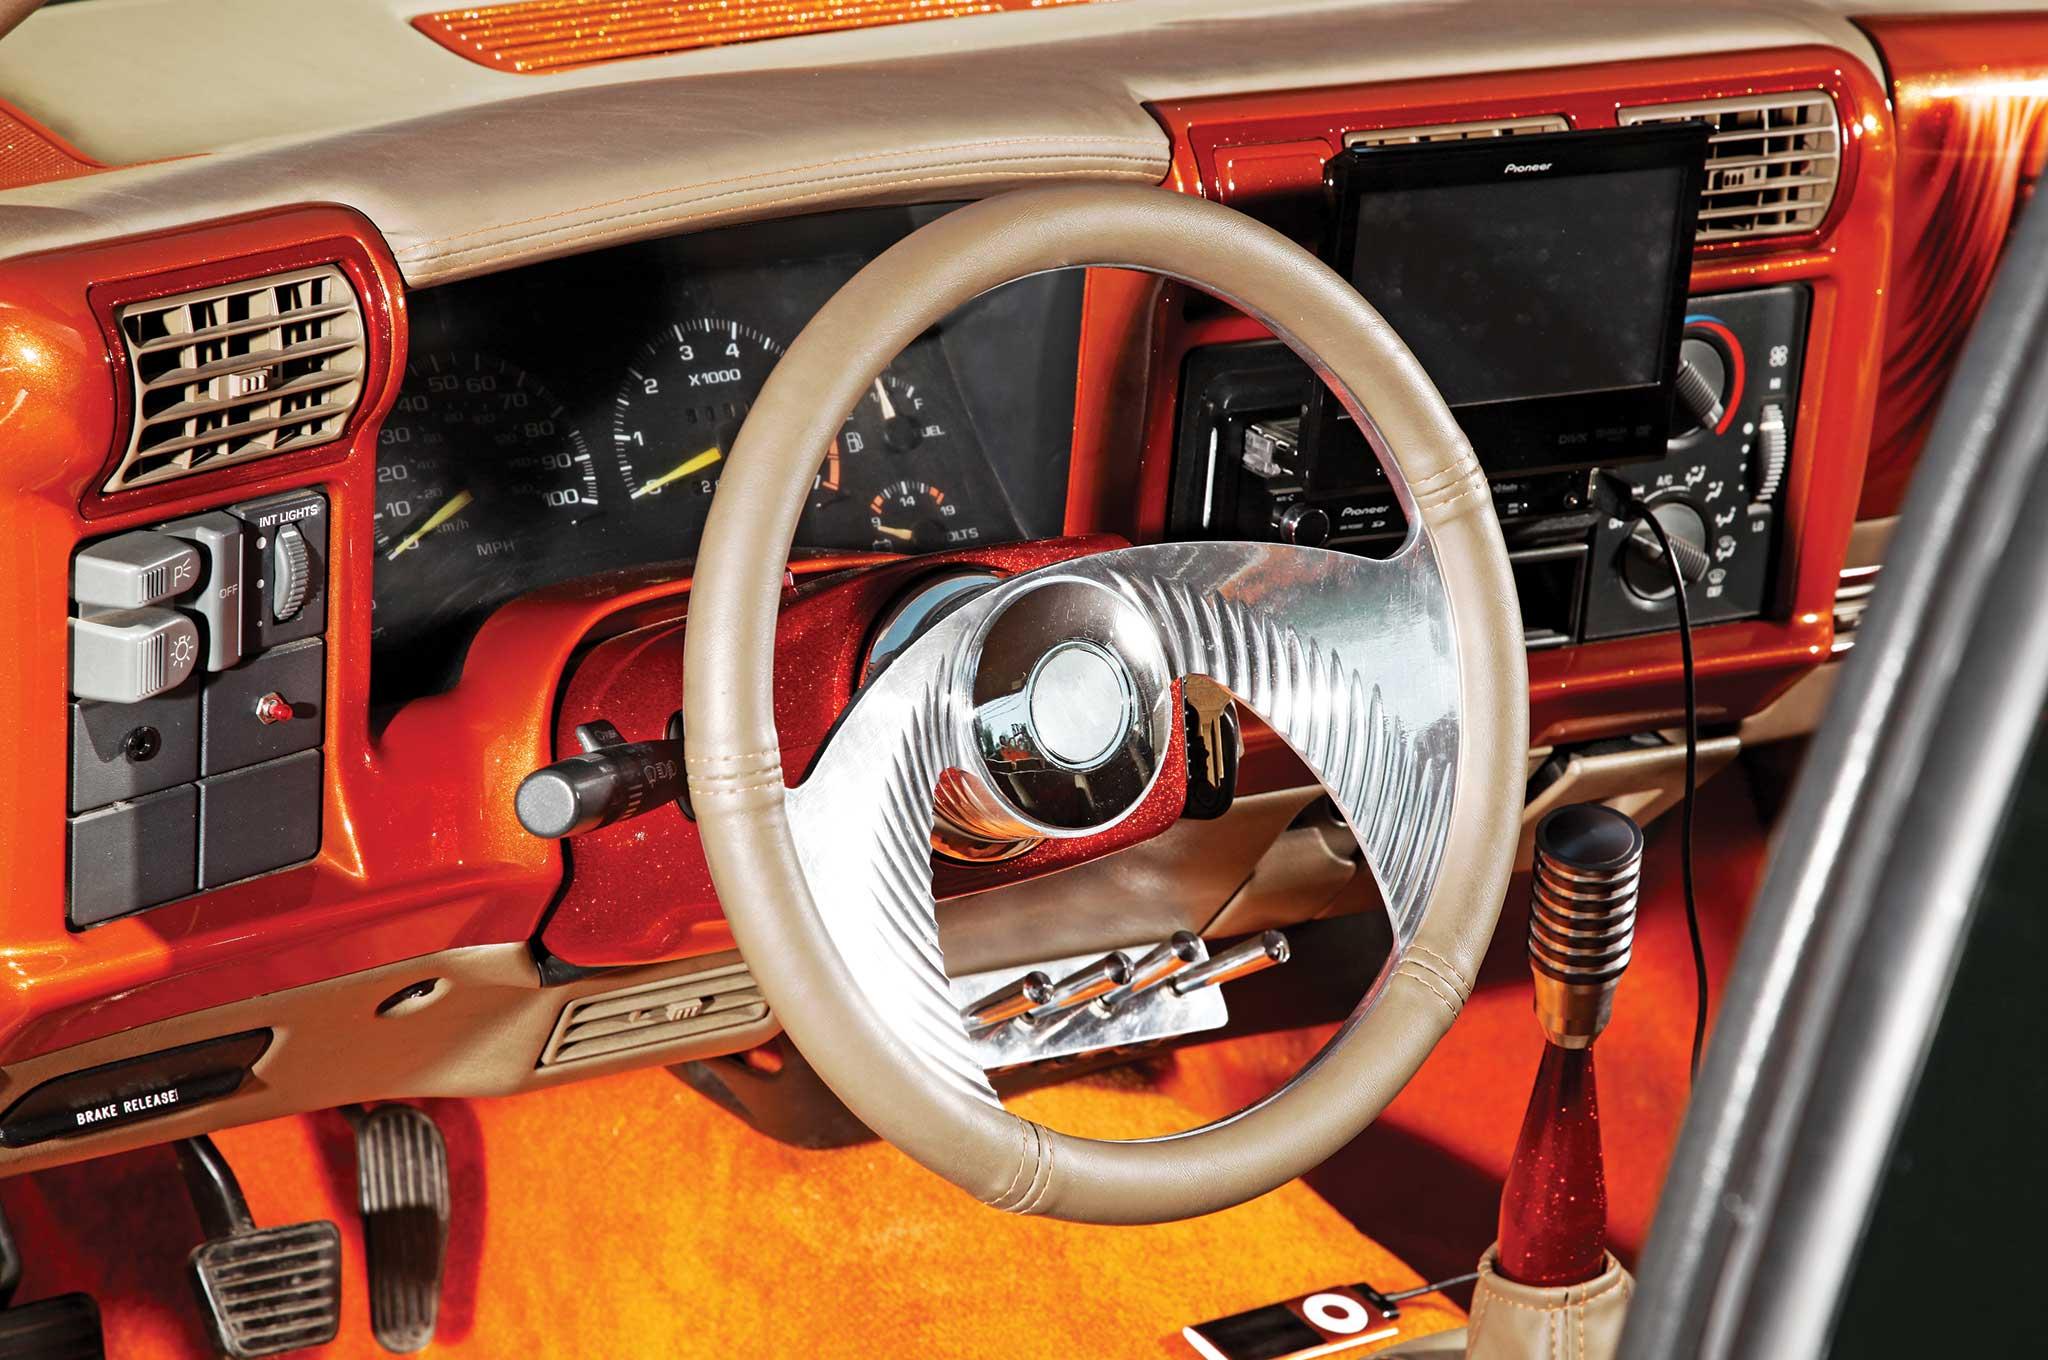 005 1996 chevy s10 steering wheel